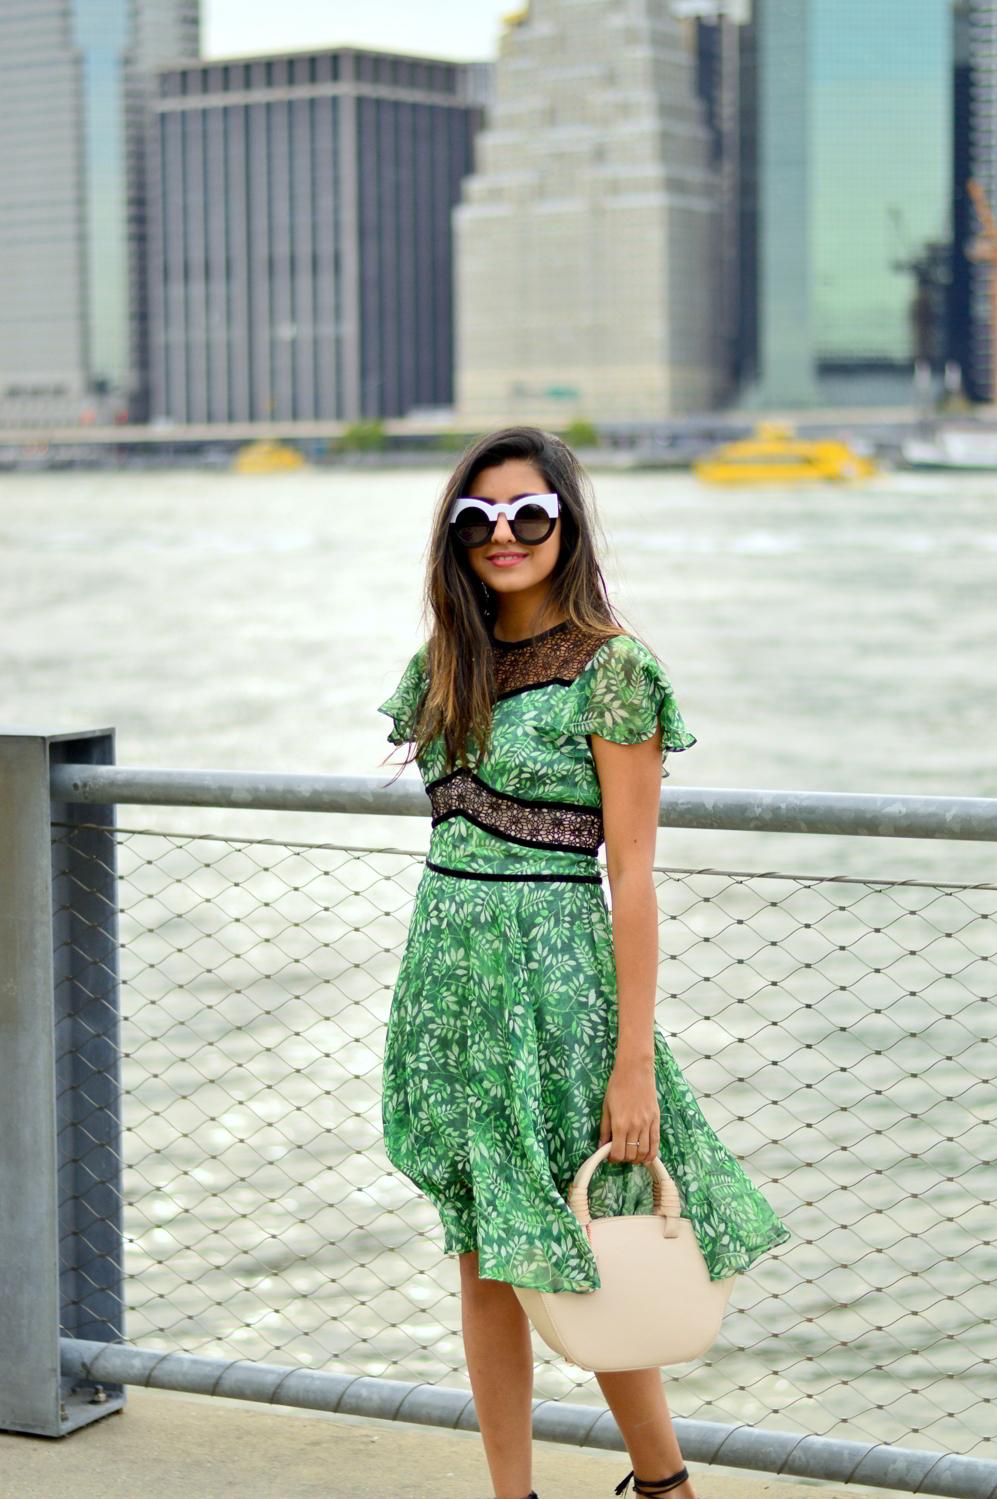 green-leaf-print-summer-sundress-brooklyn-bridge-nyc-blogger-outfit 5